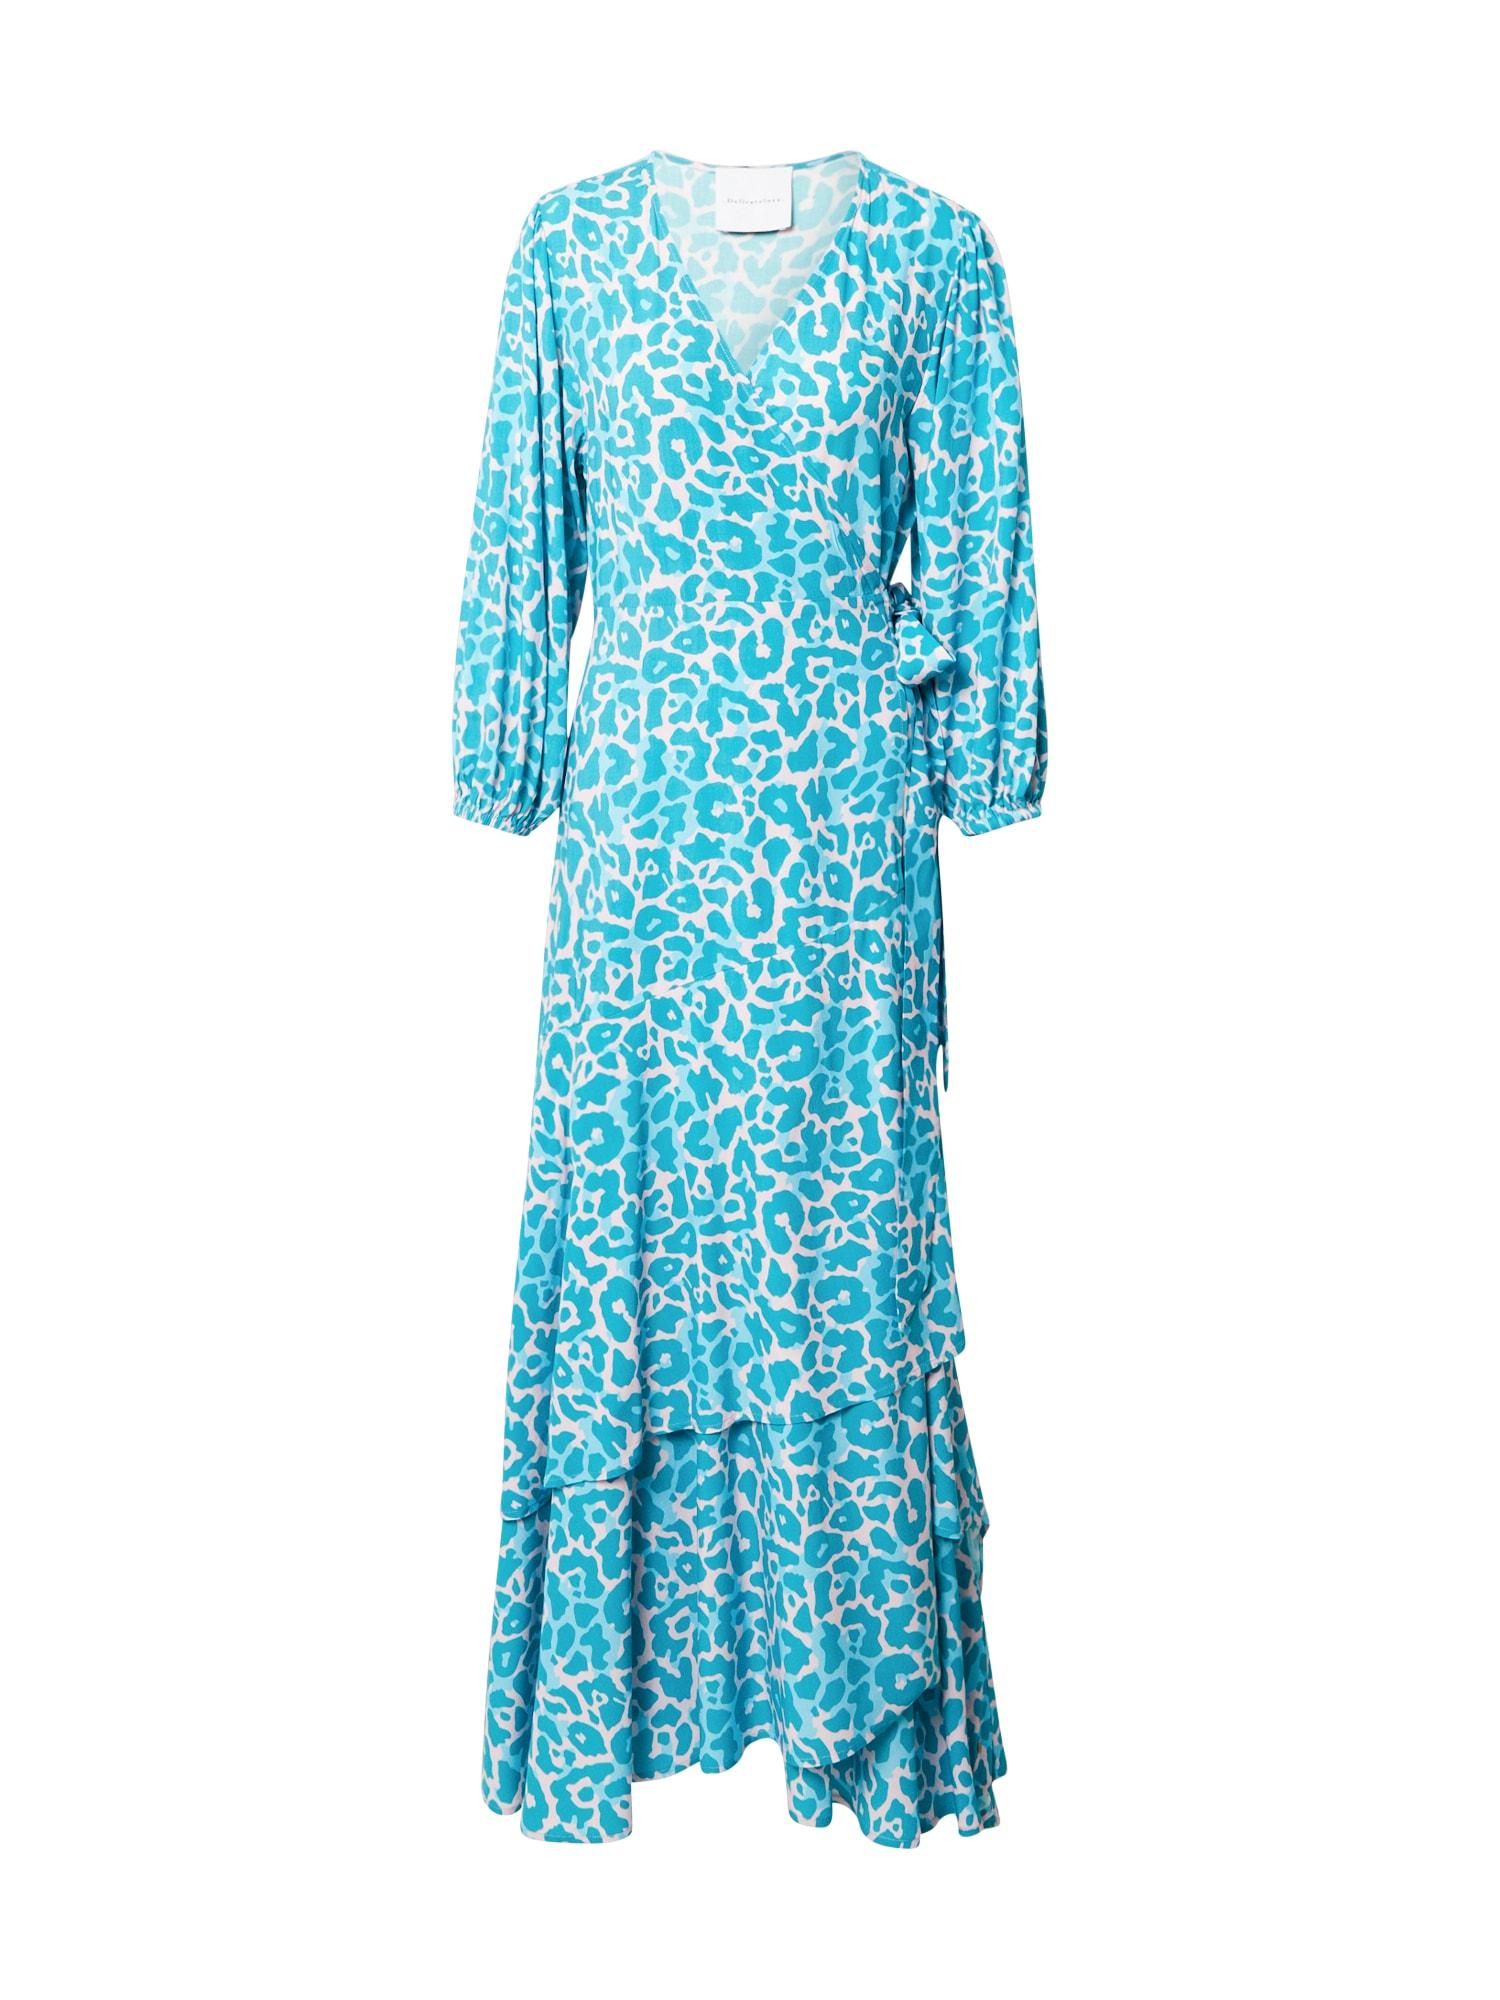 DELICATELOVE Suknelė